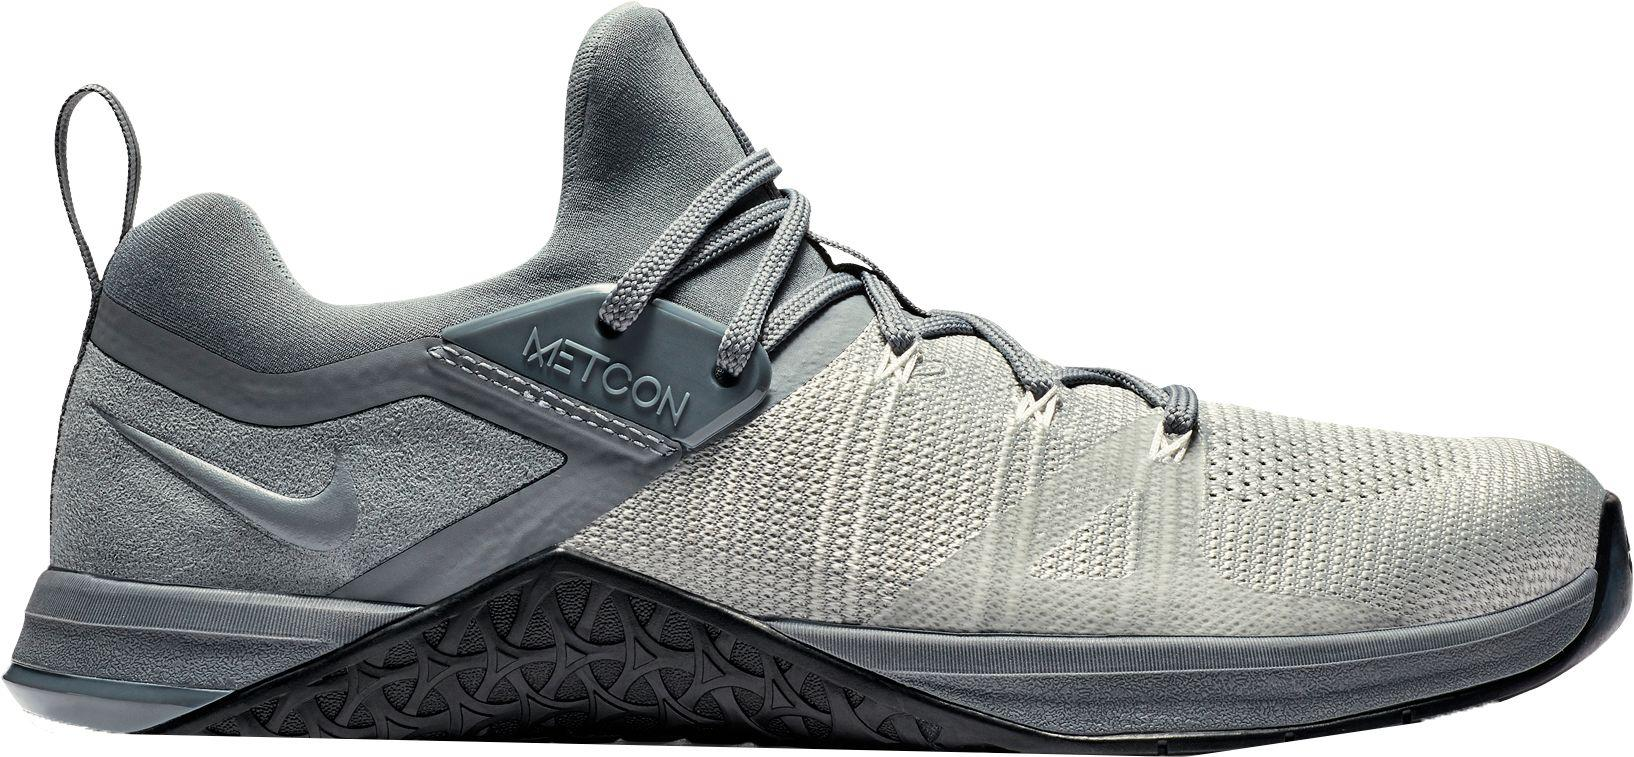 2602d405bdb Lyst - Nike Metcon Flyknit 3 Training Shoes in Gray for Men